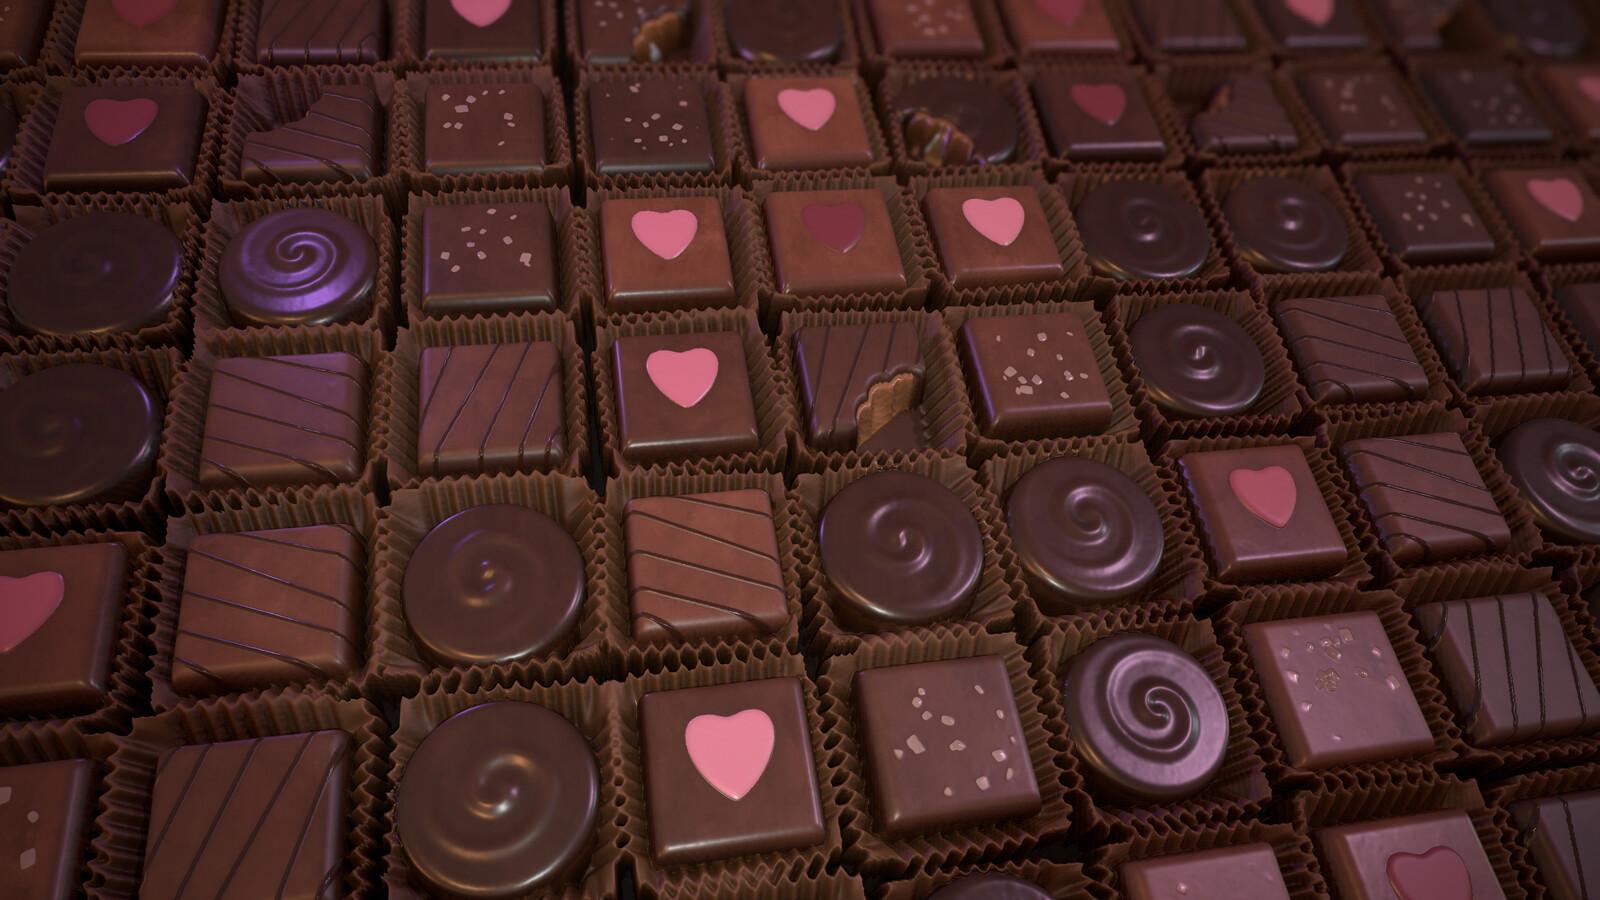 Chocolate Assortment Material - Substance Designer